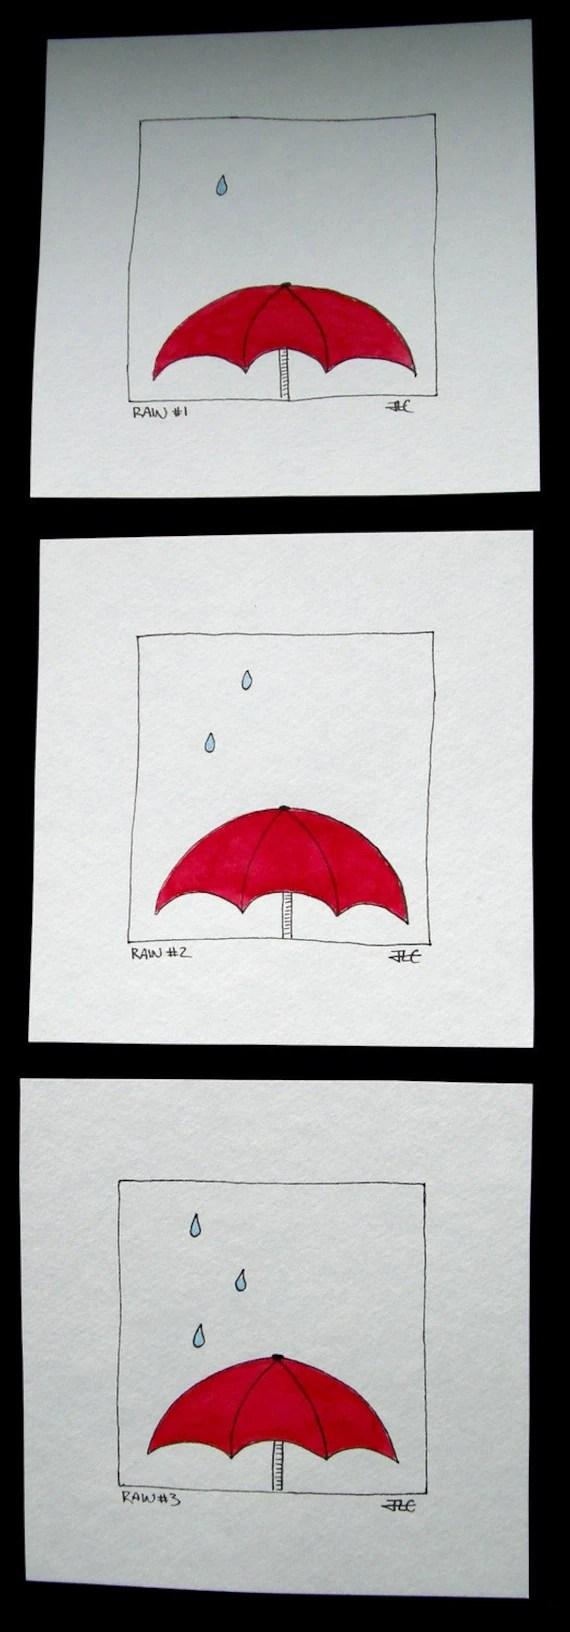 Original Ink Illustration - Series of 3 Red Umbrellas